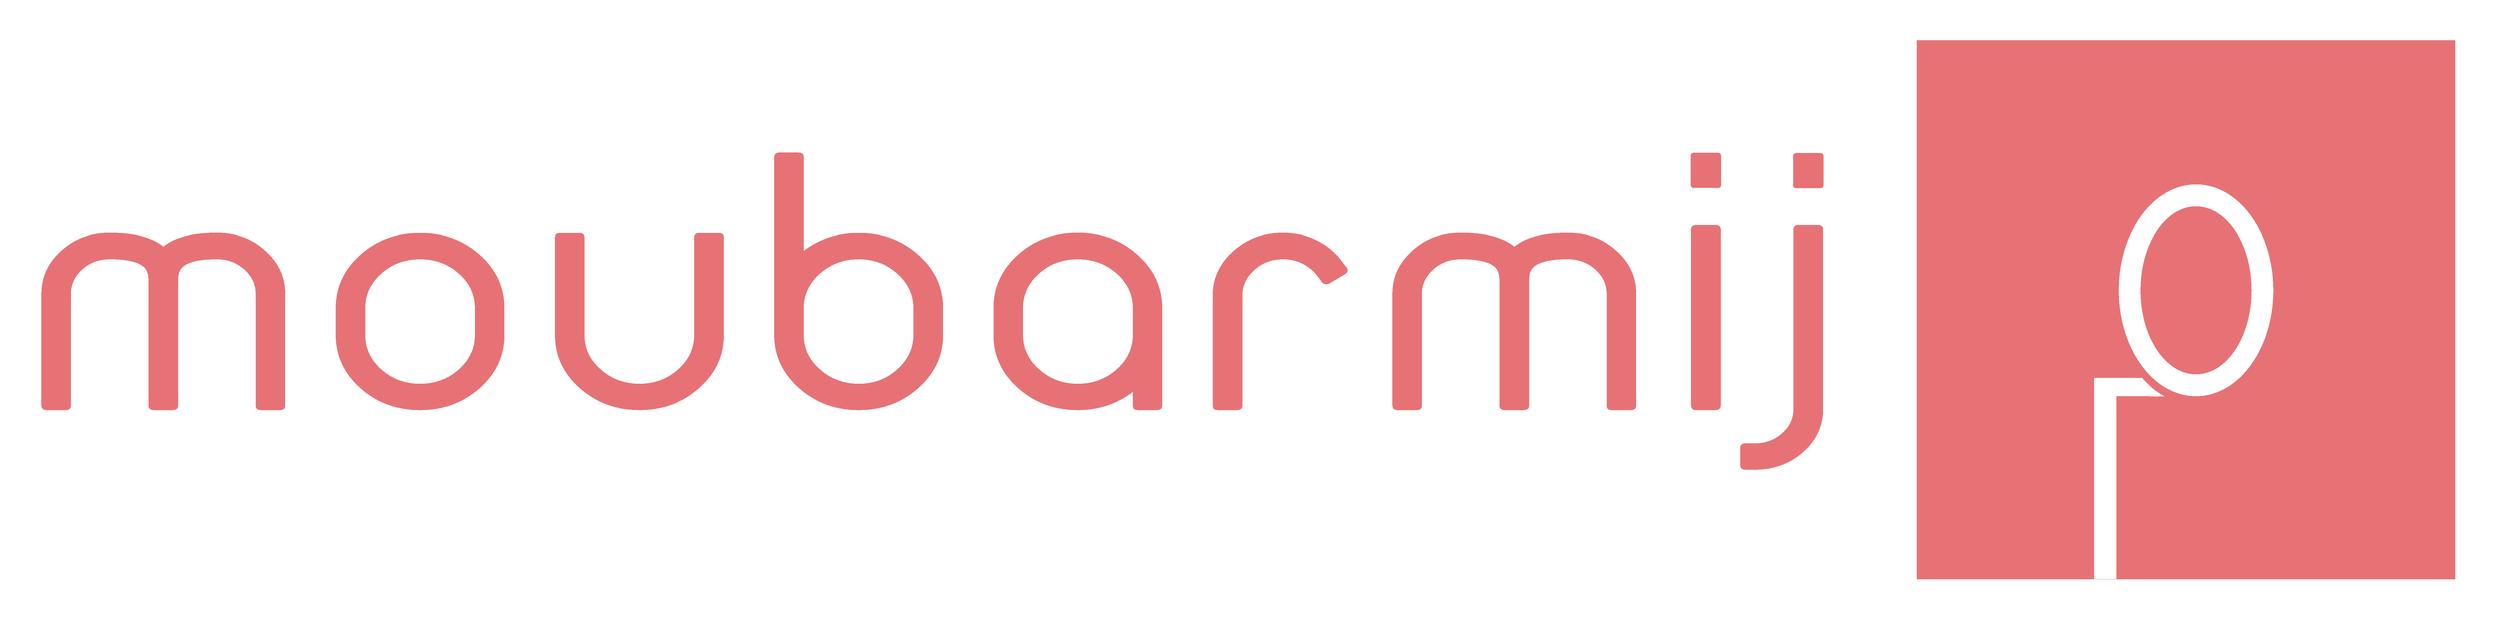 Moubarmij is an e-learning platform that teaches programming via Arabic video tutorials.